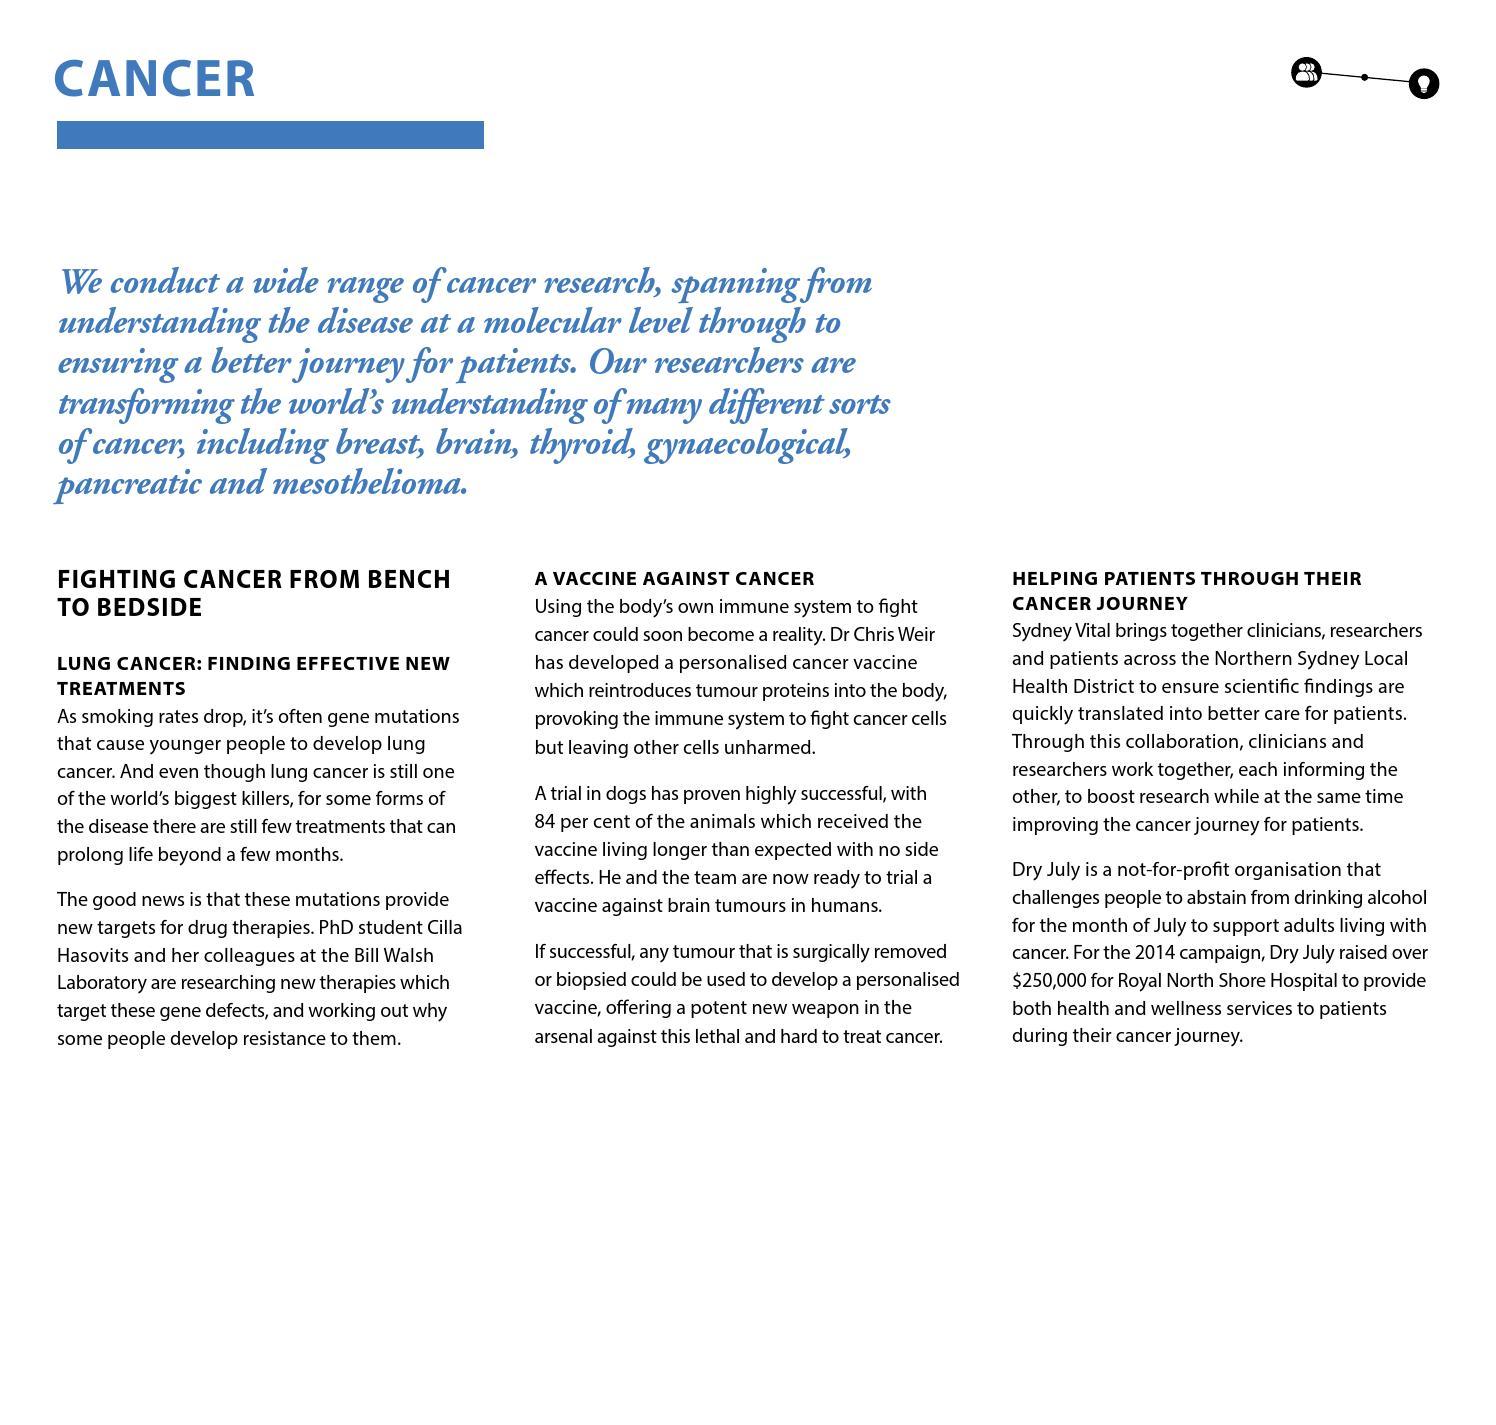 Cancer Vaccine Successful